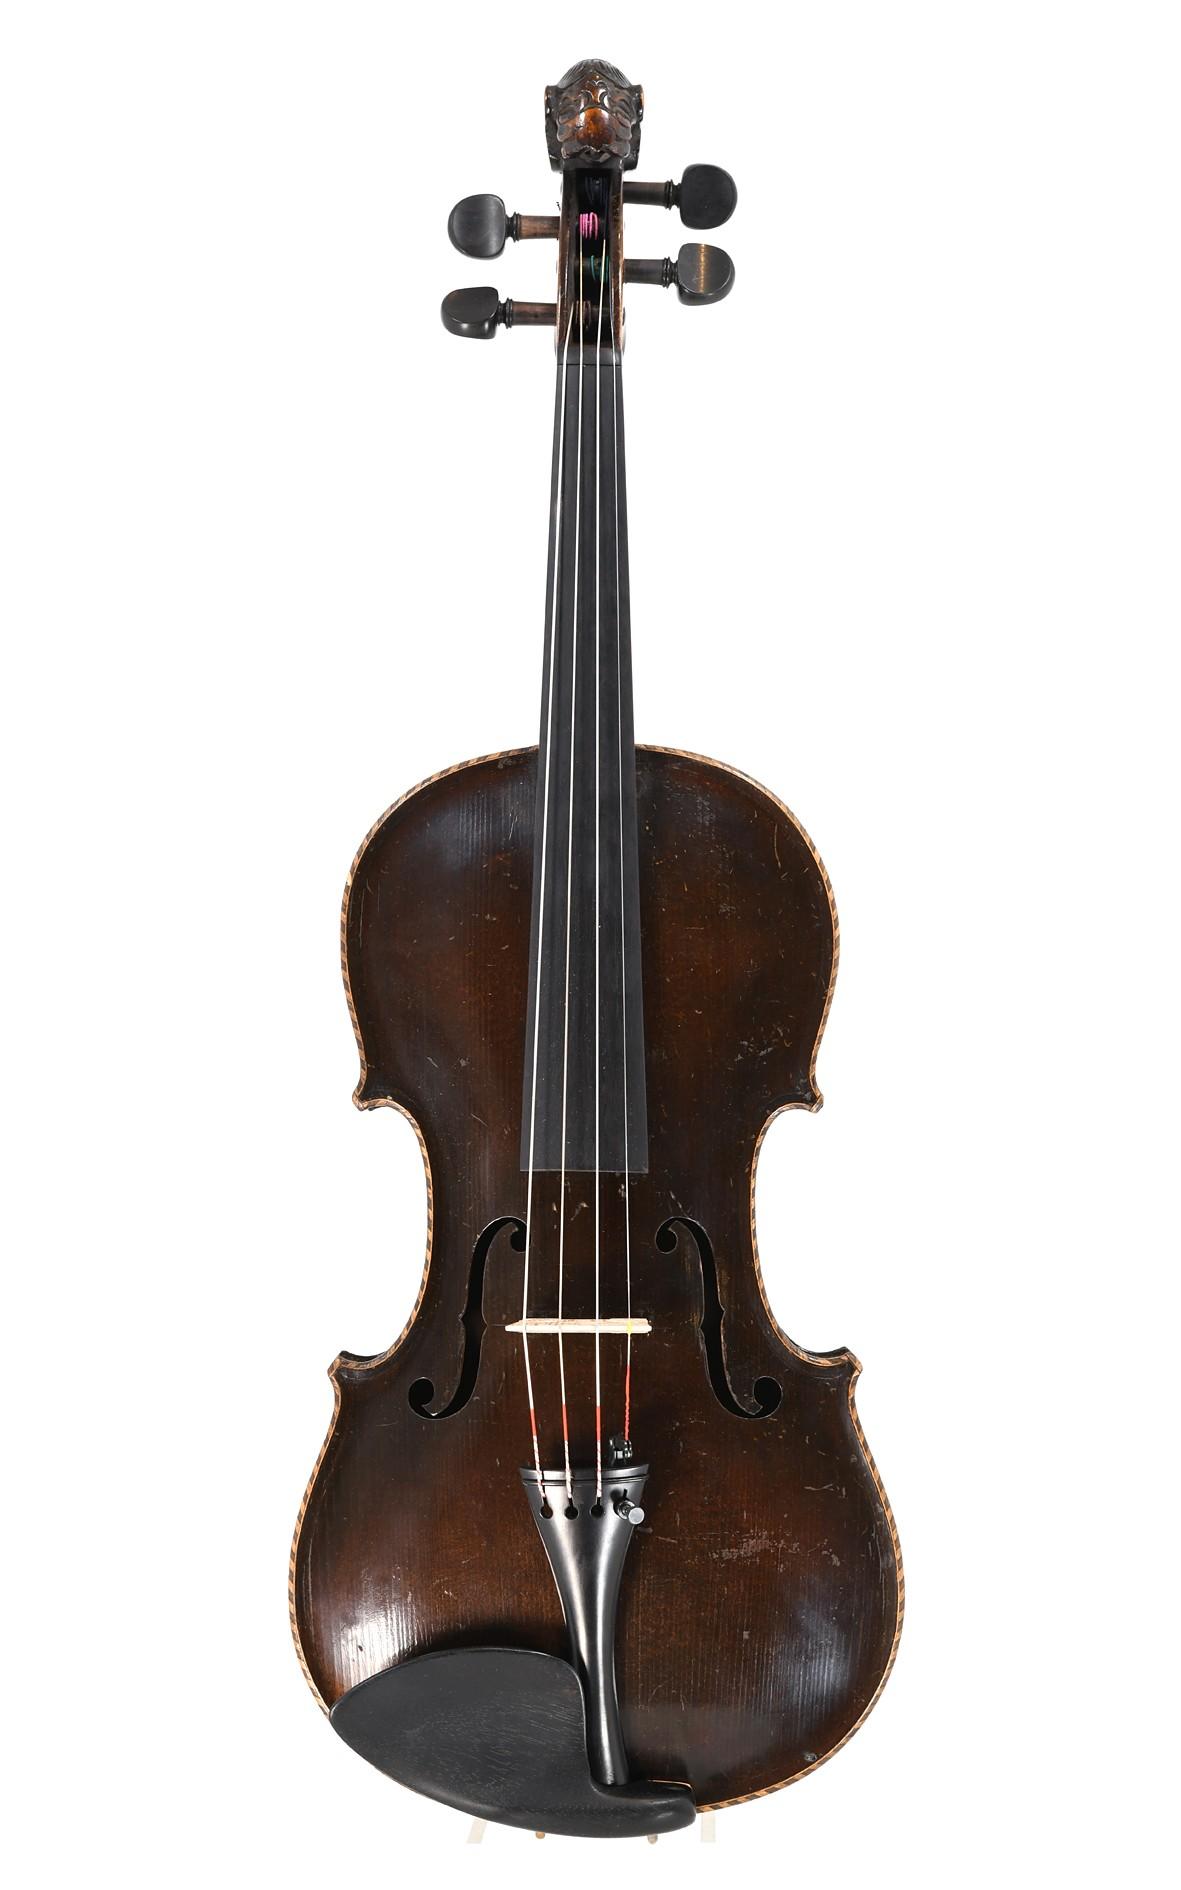 Lion head violin Saxony approx. 1900 - top